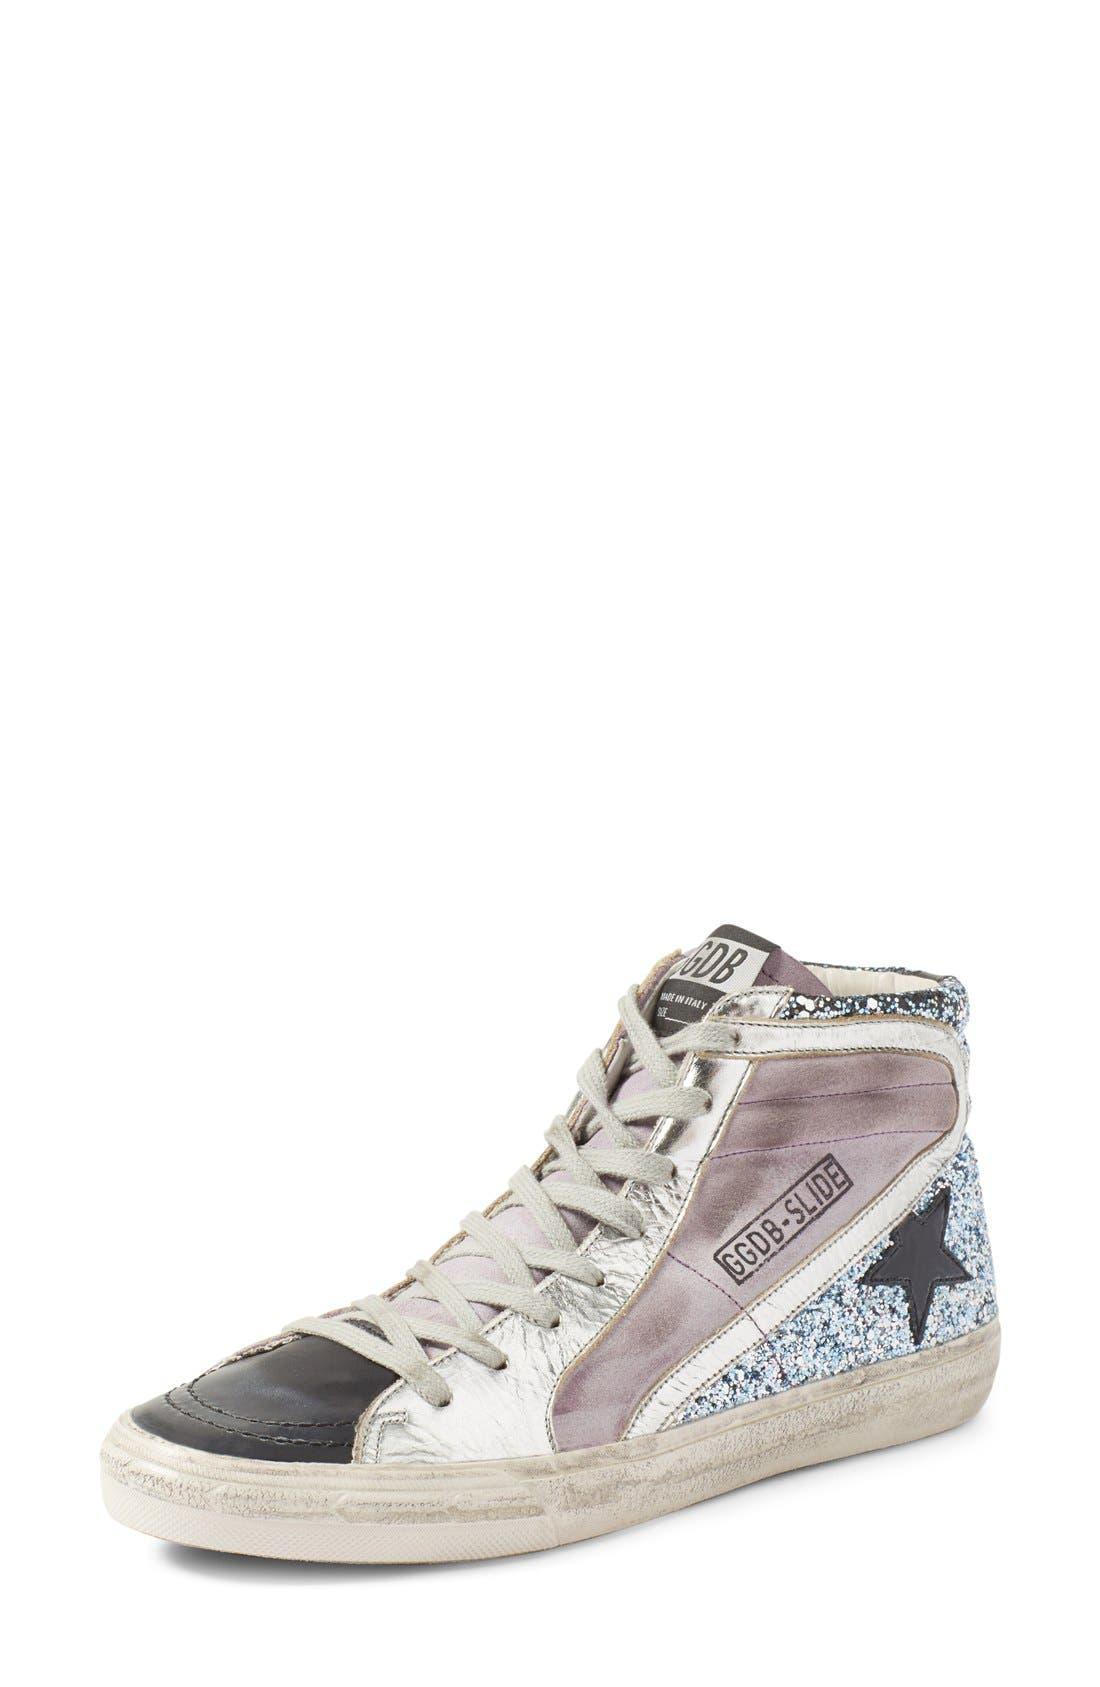 Alternate Image 1 Selected - Golden Goose 'Slide' High Top Sneaker (Women)